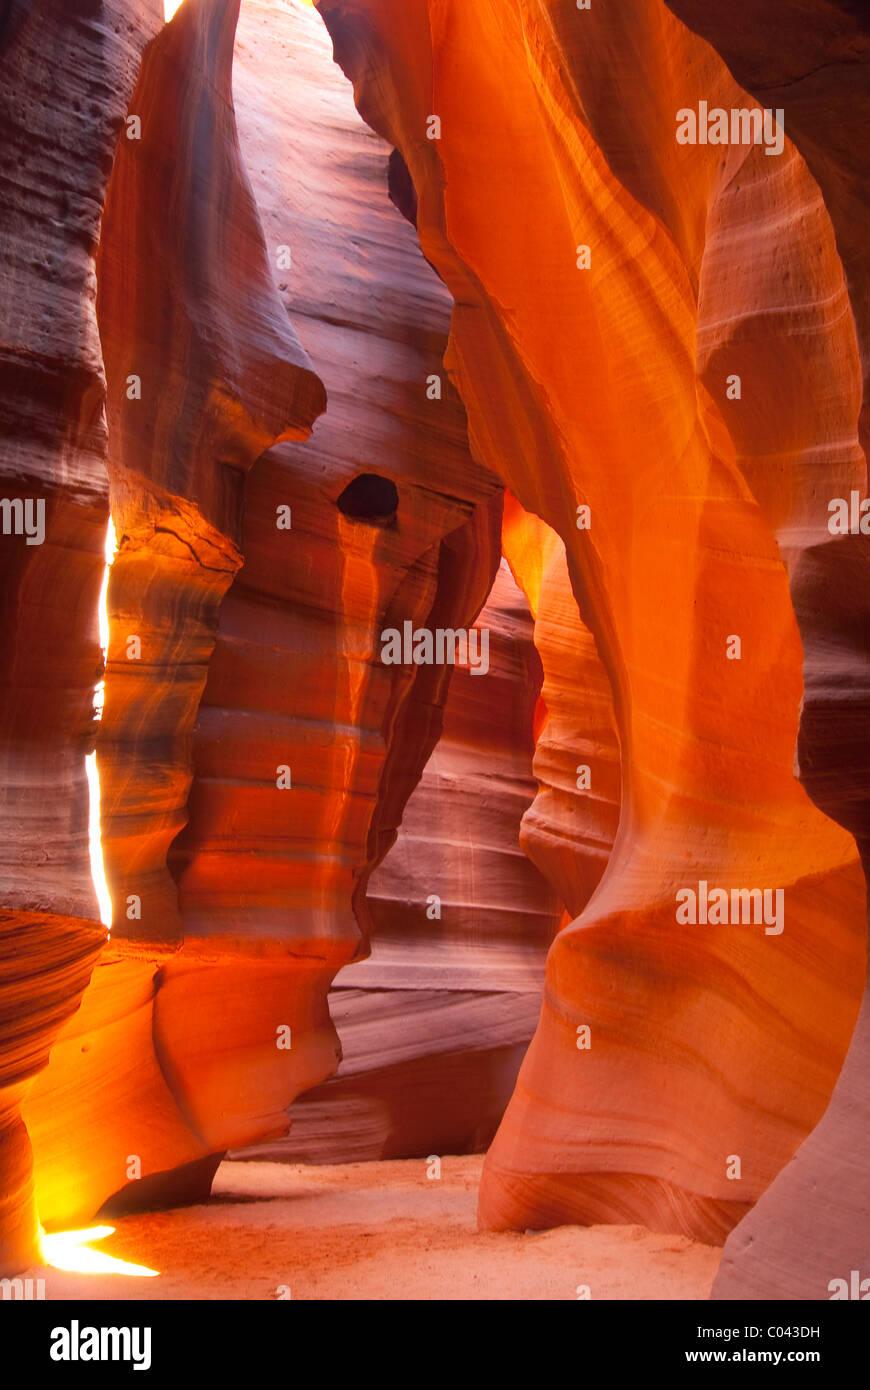 Beautiful games of colors and light at Upper Antelope Canyon, Arizona - Stock Image